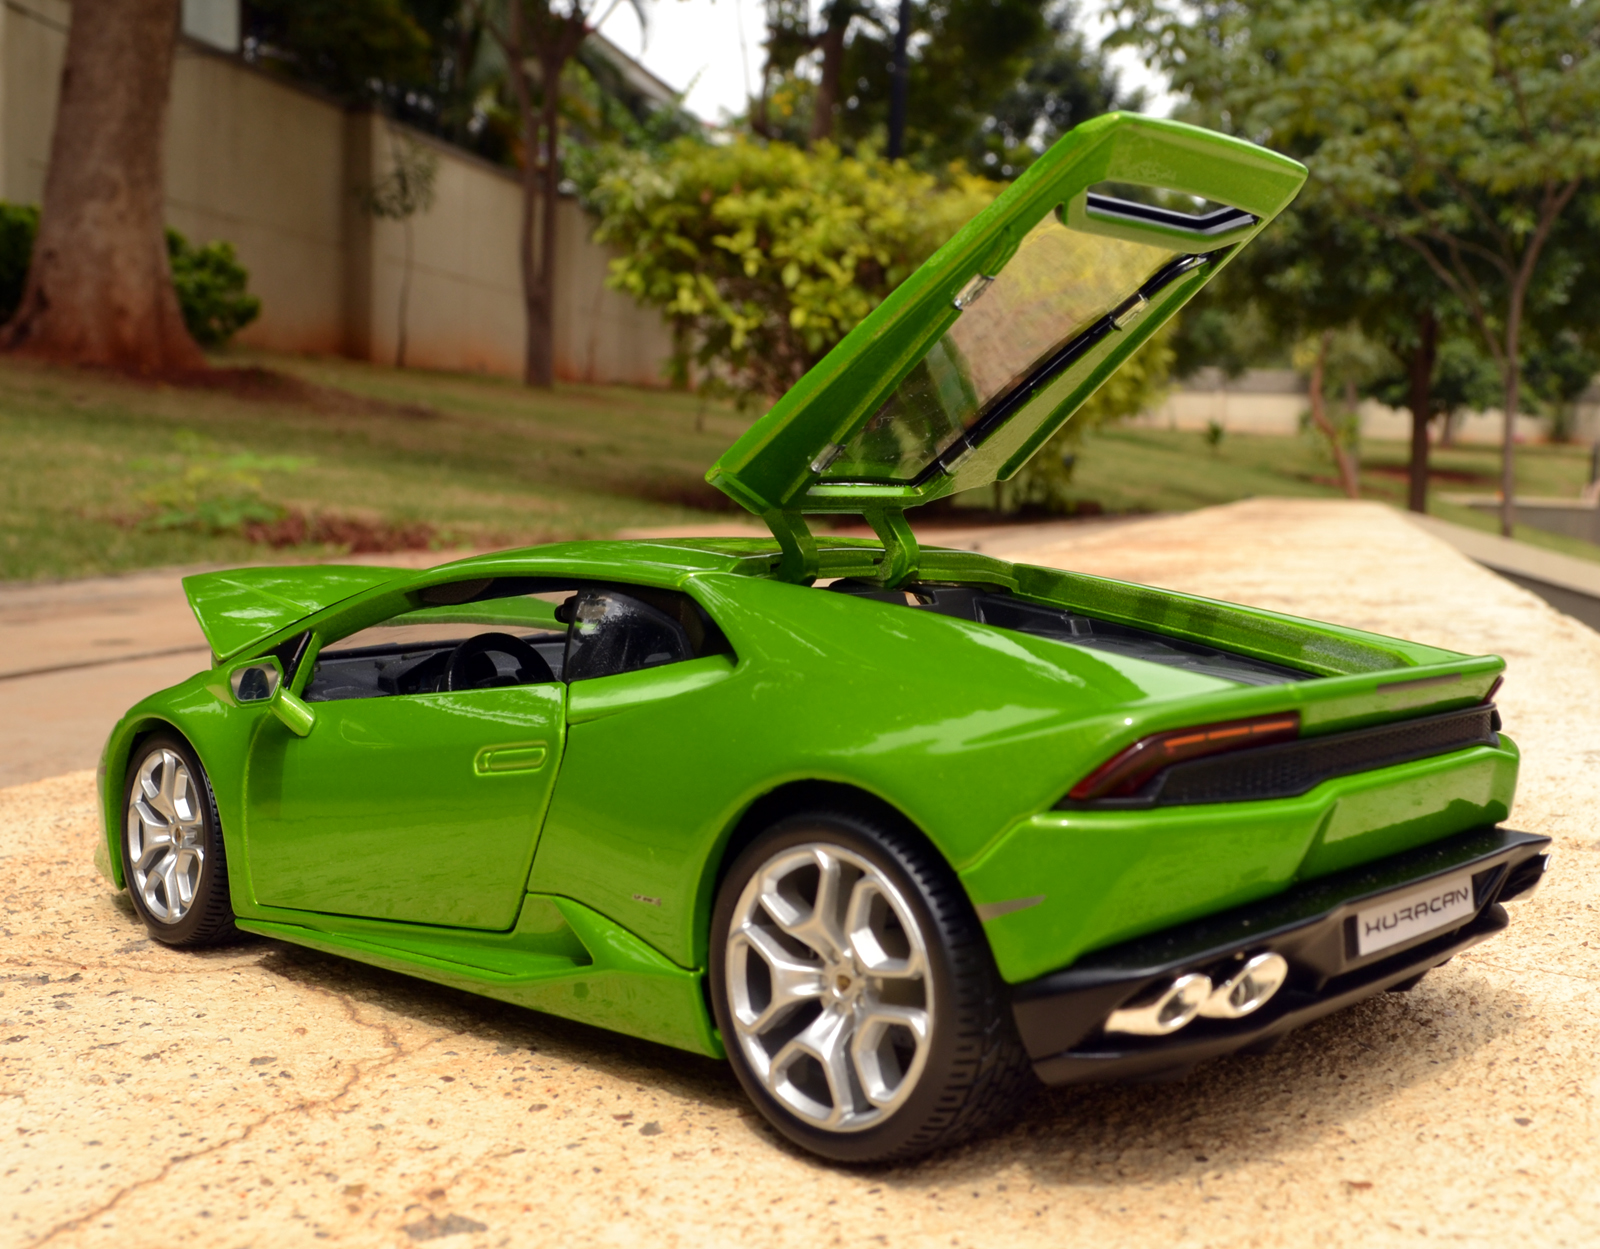 Bburago Lamborghini Huracan Lp610 4 Diecast Car Review